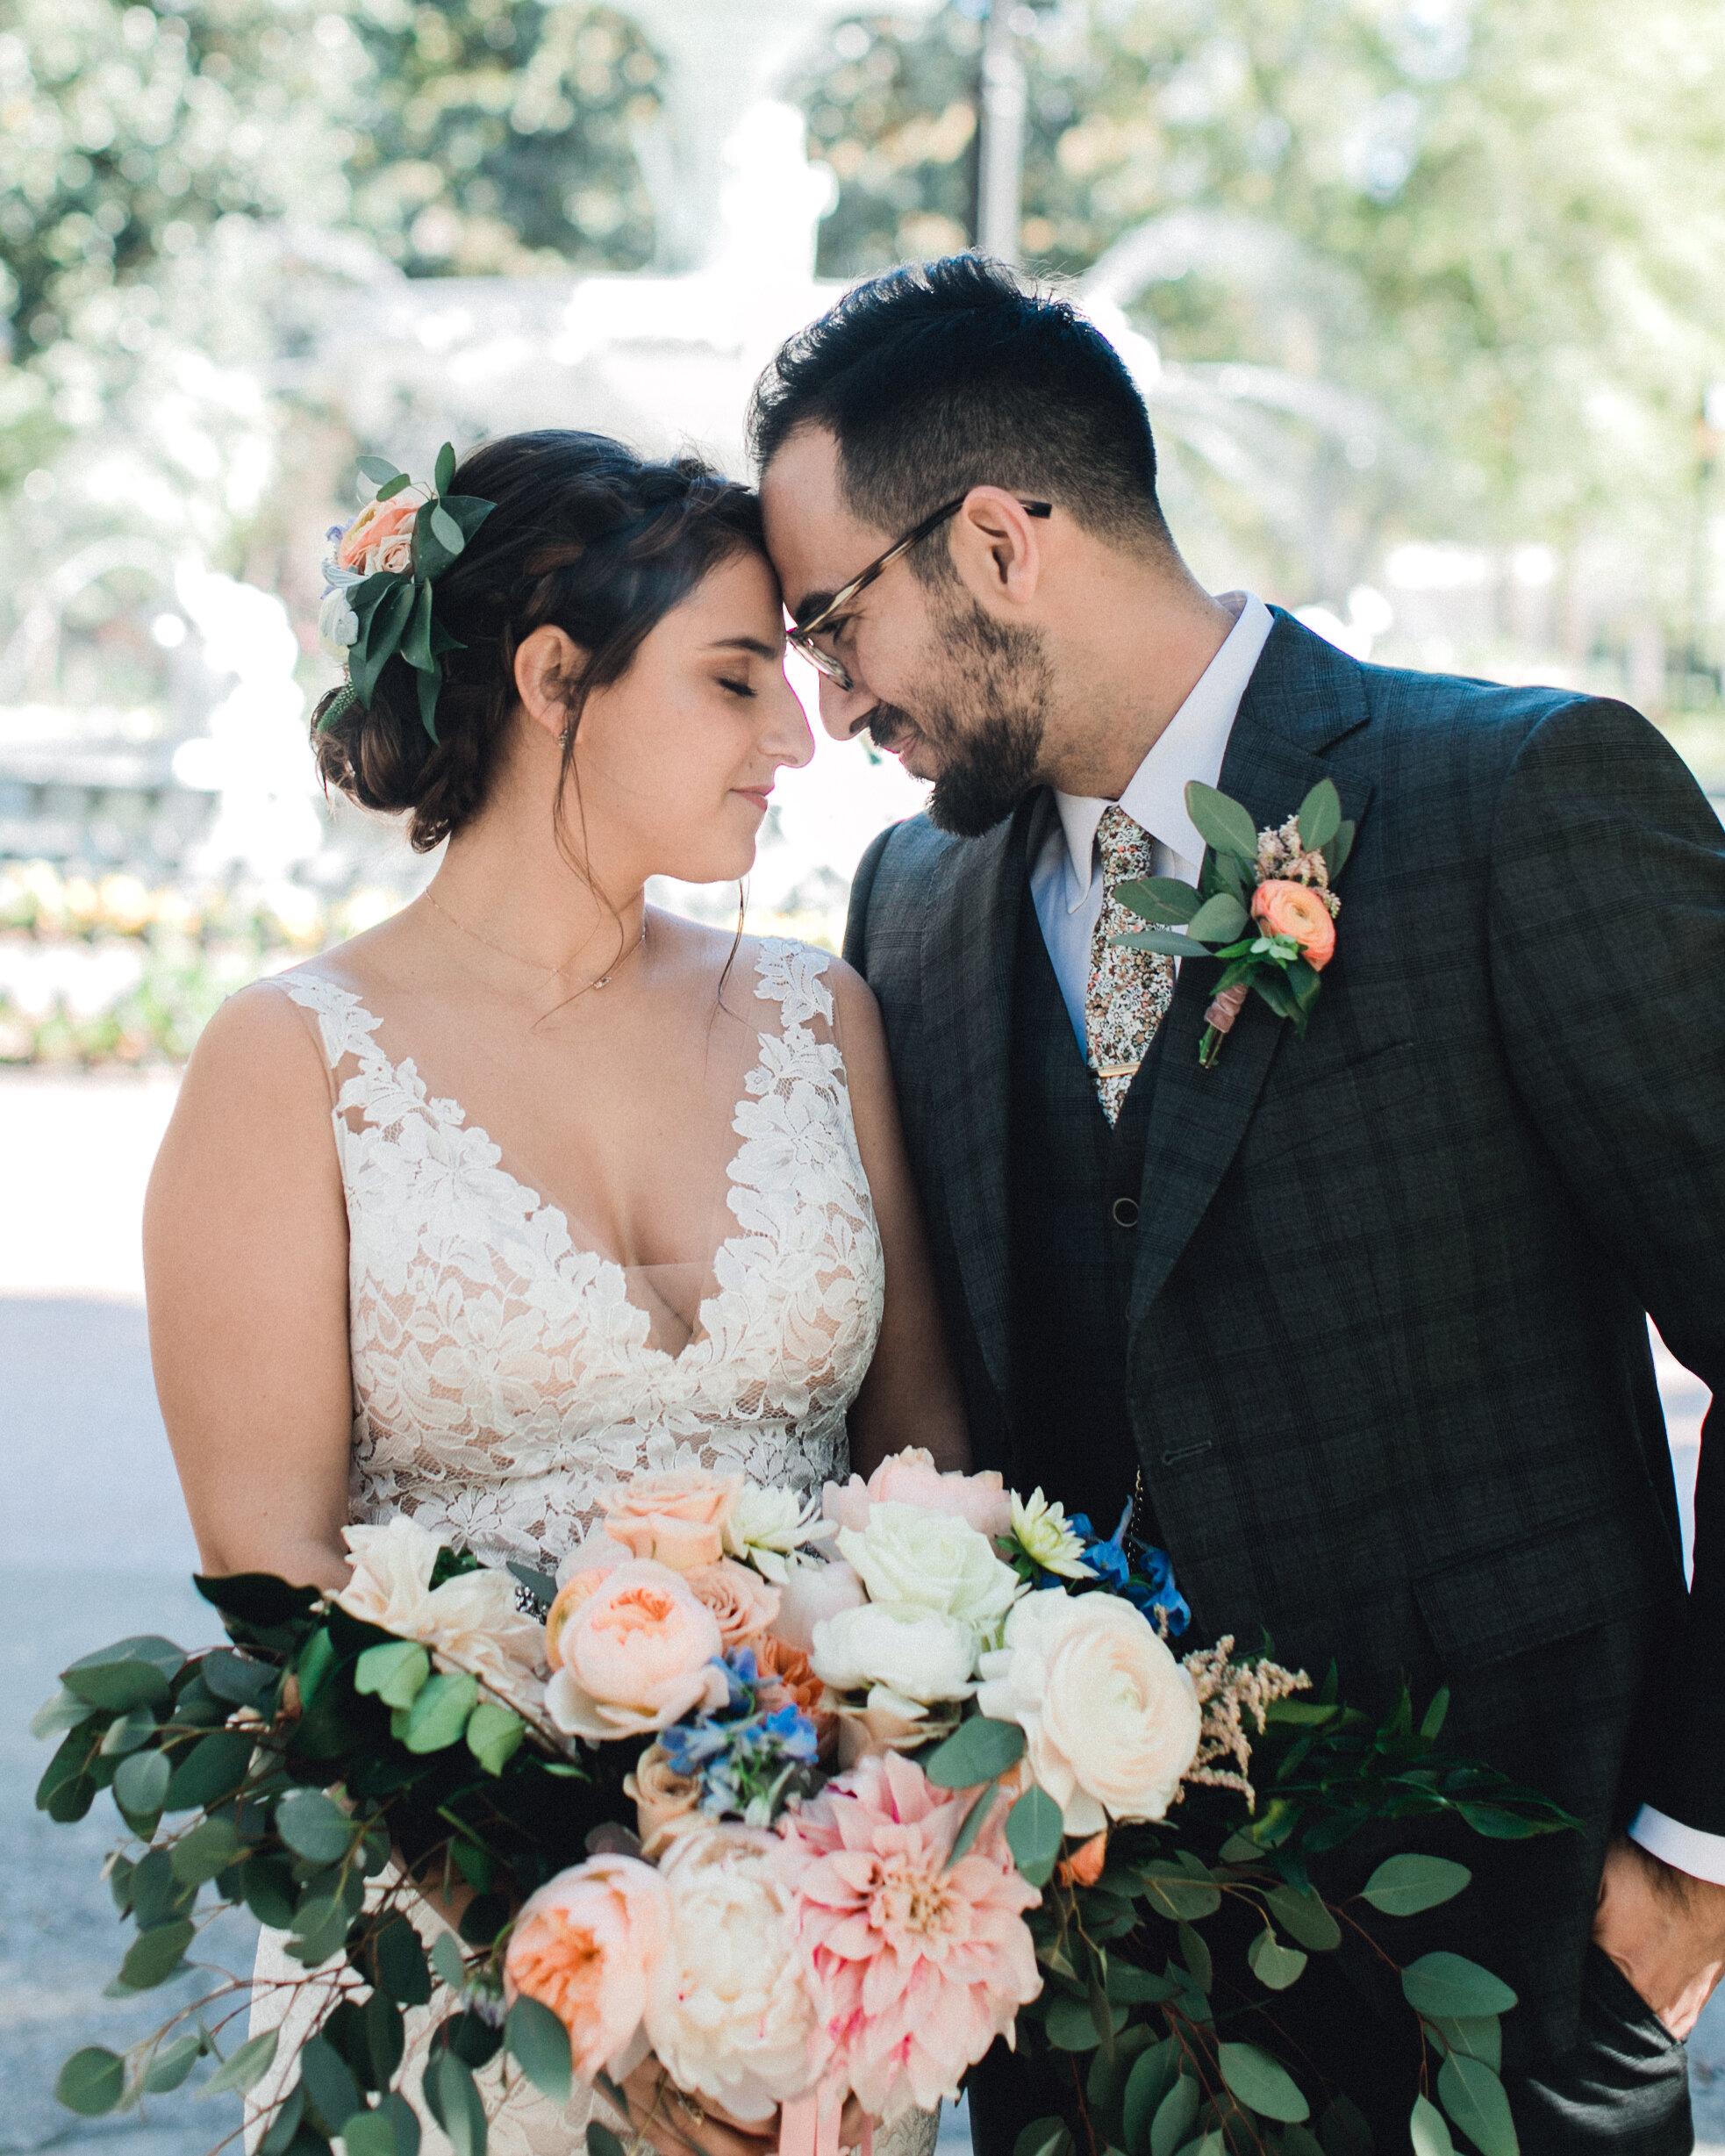 ivory-and-beau-blog-weddings-ivory-and-beau-couple-dominique-and-andres-savannah-florist-wedding-planning-savannah-bridal-boutique-wedding-flowers-KIP_WEBERWEDDING_RAILROADMUSEUM-677.JPG